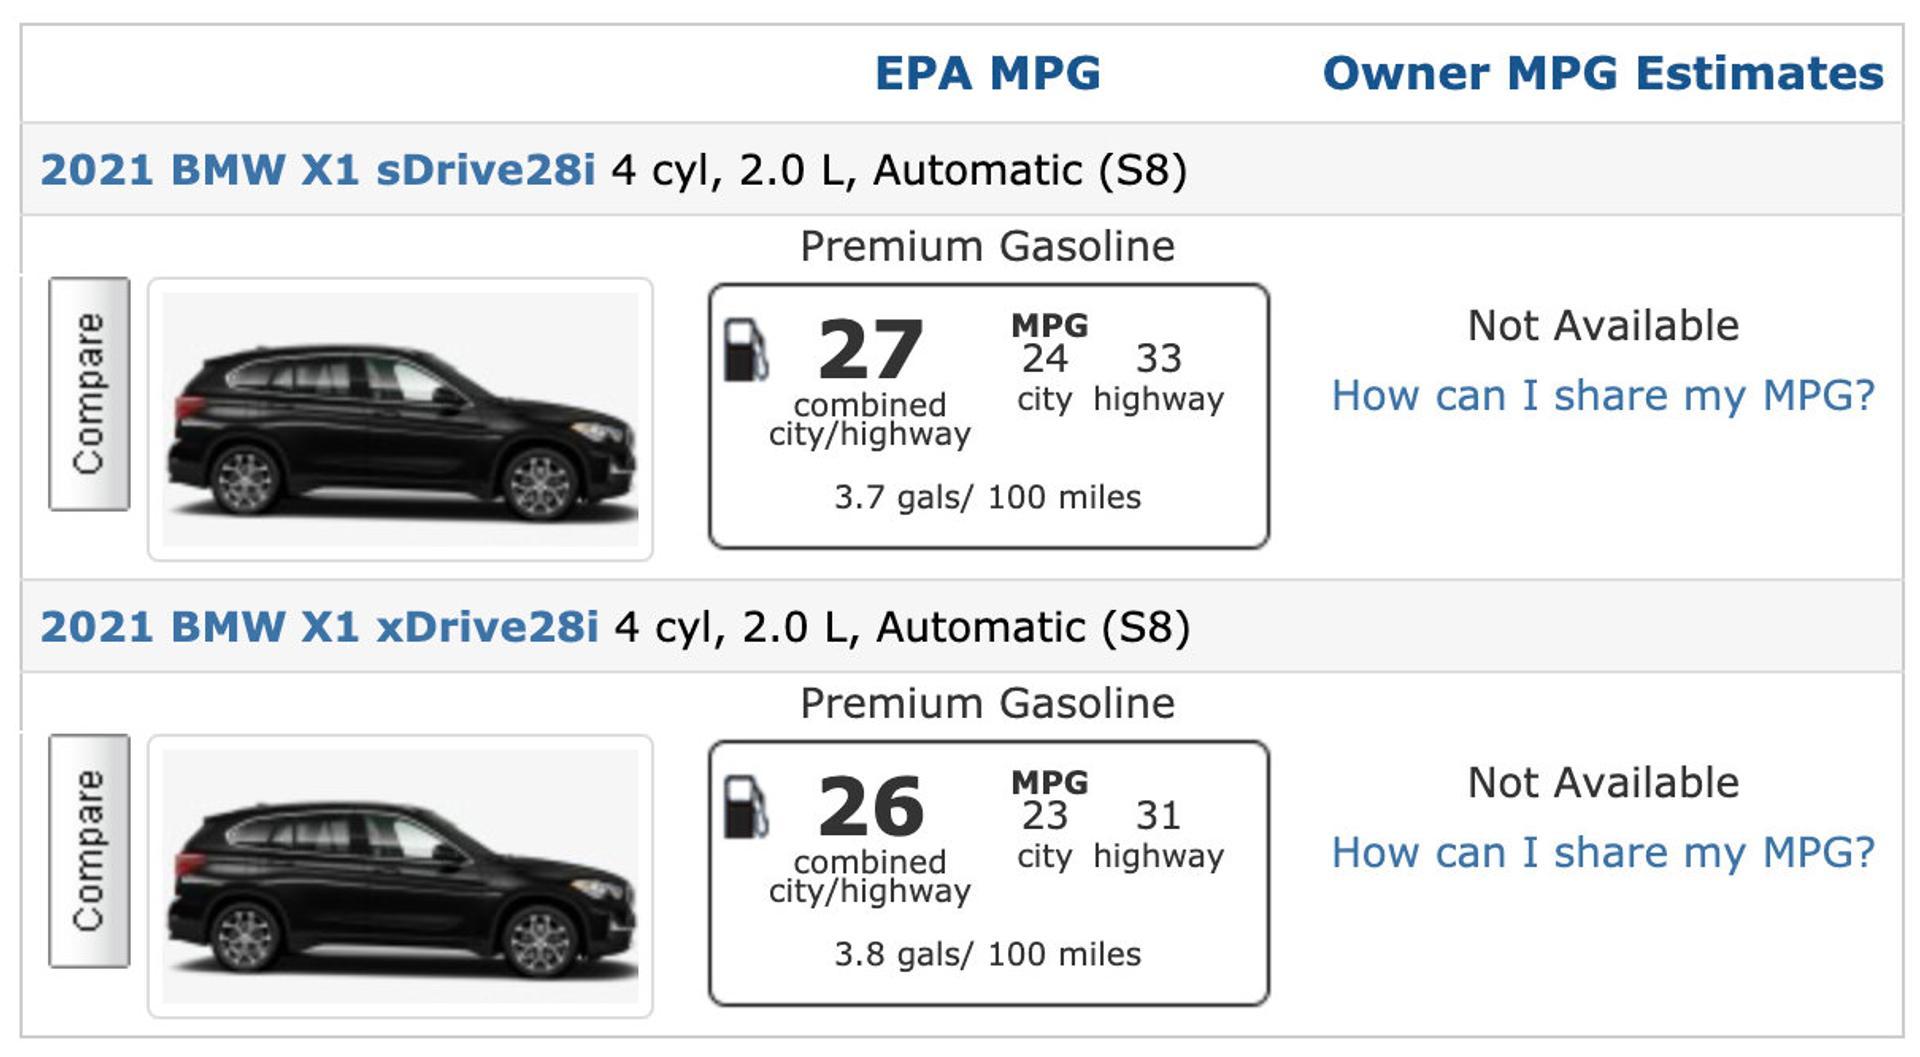 BMW X1 fuel economy numbers